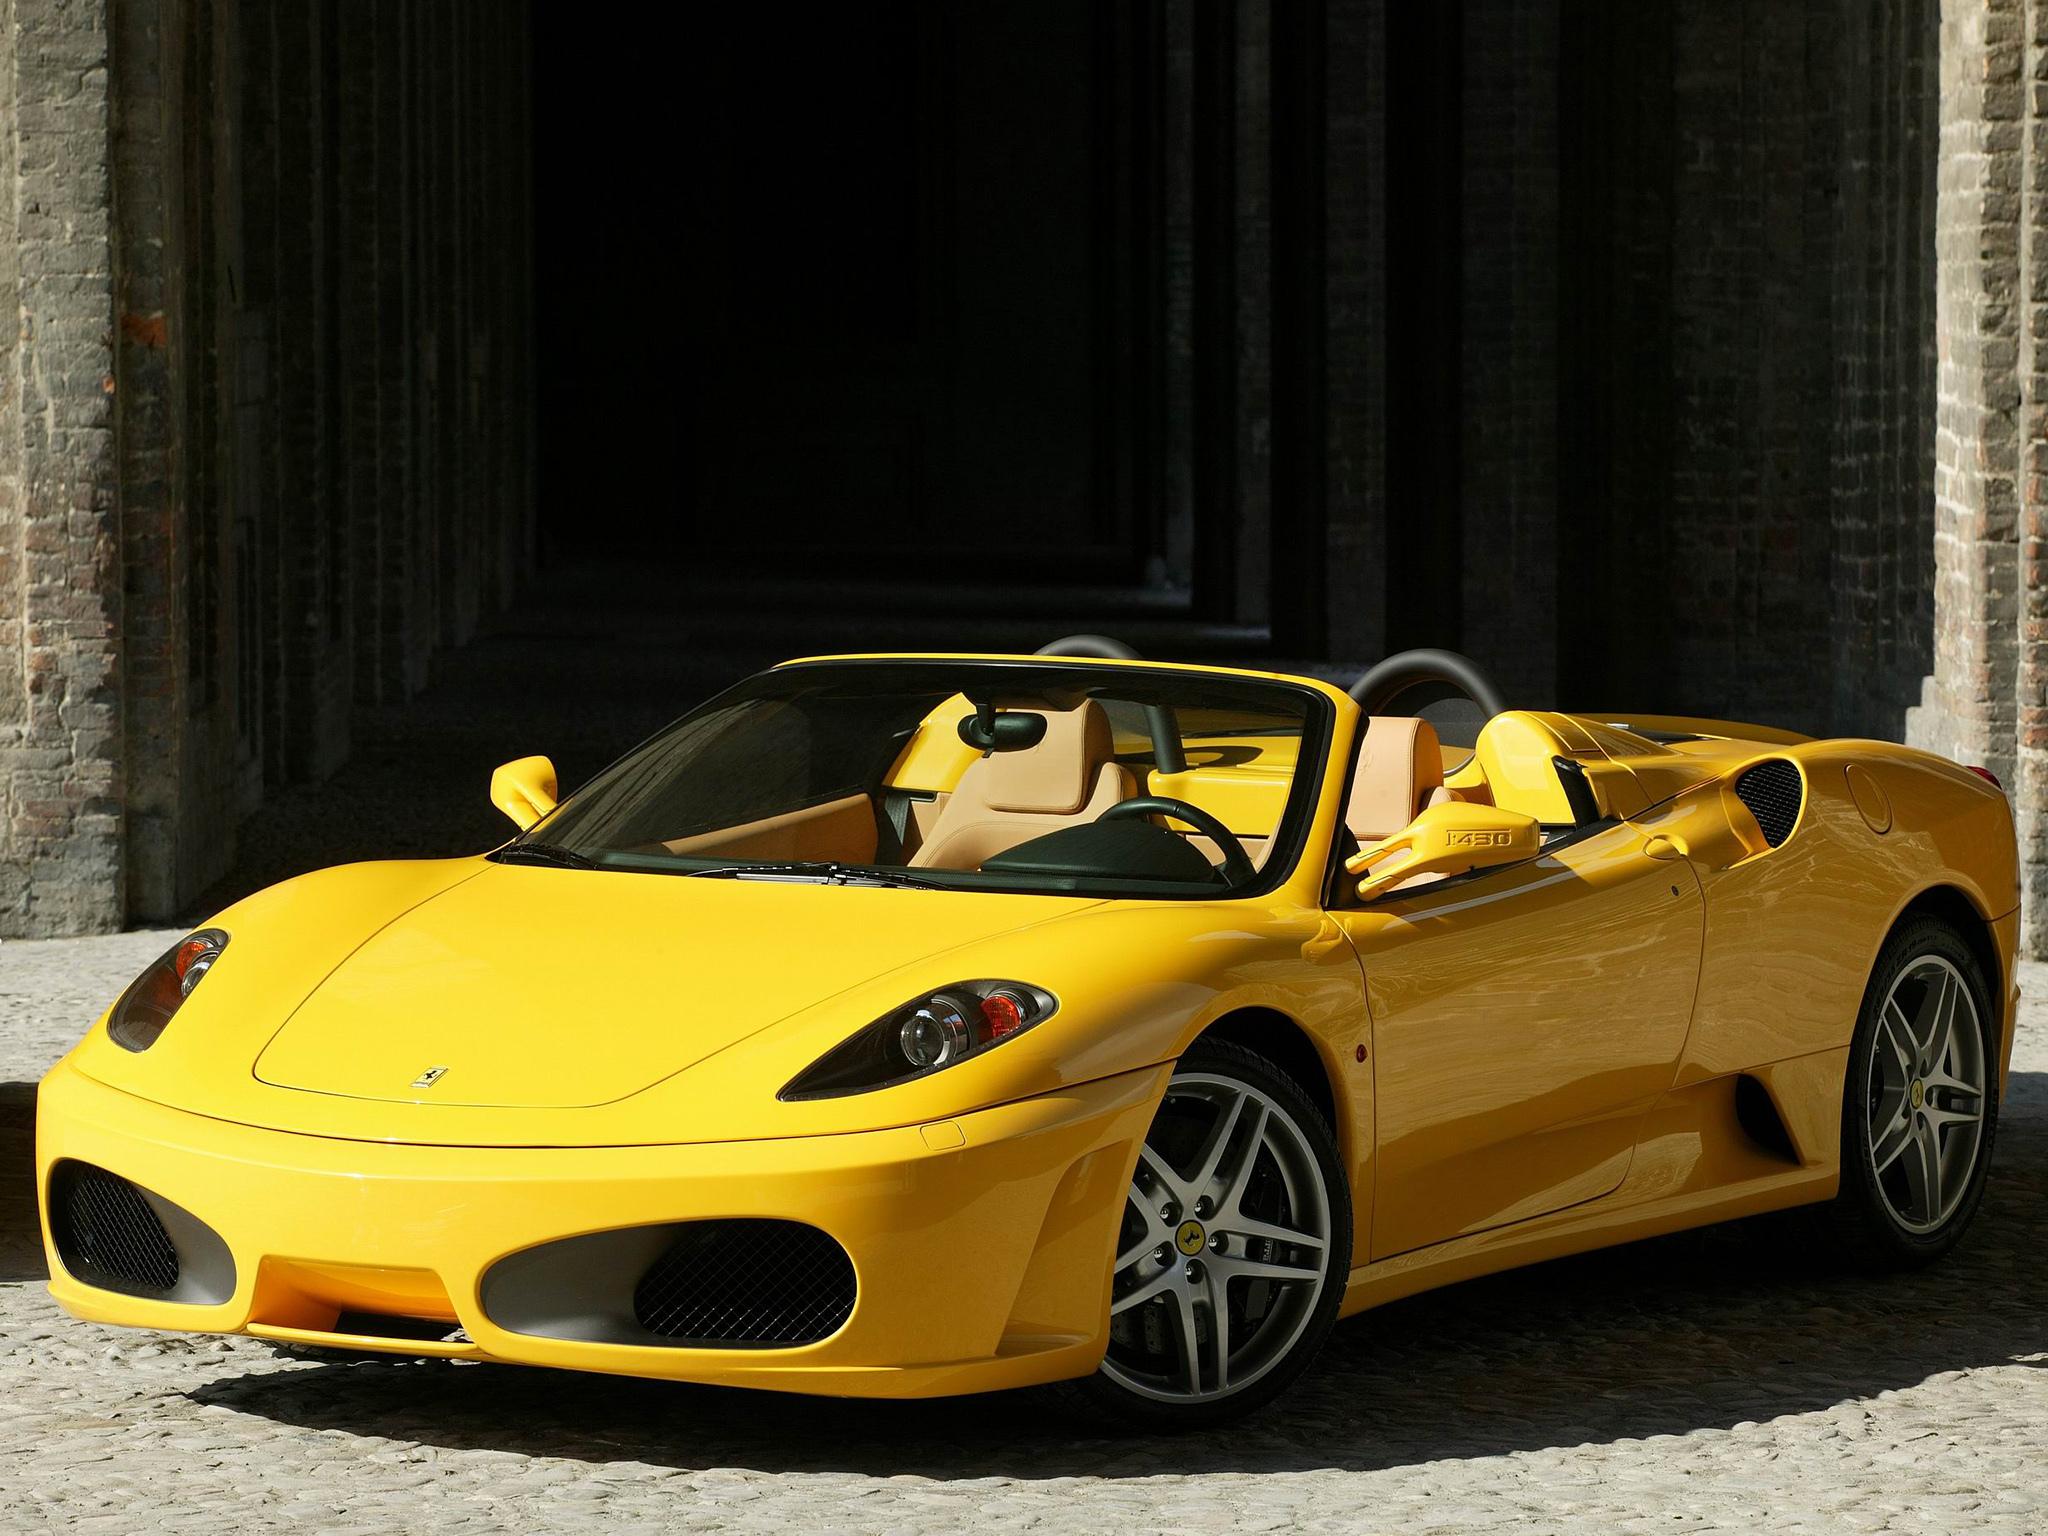 Fondos De Pantalla Ferrari F430 Araña Amarillo